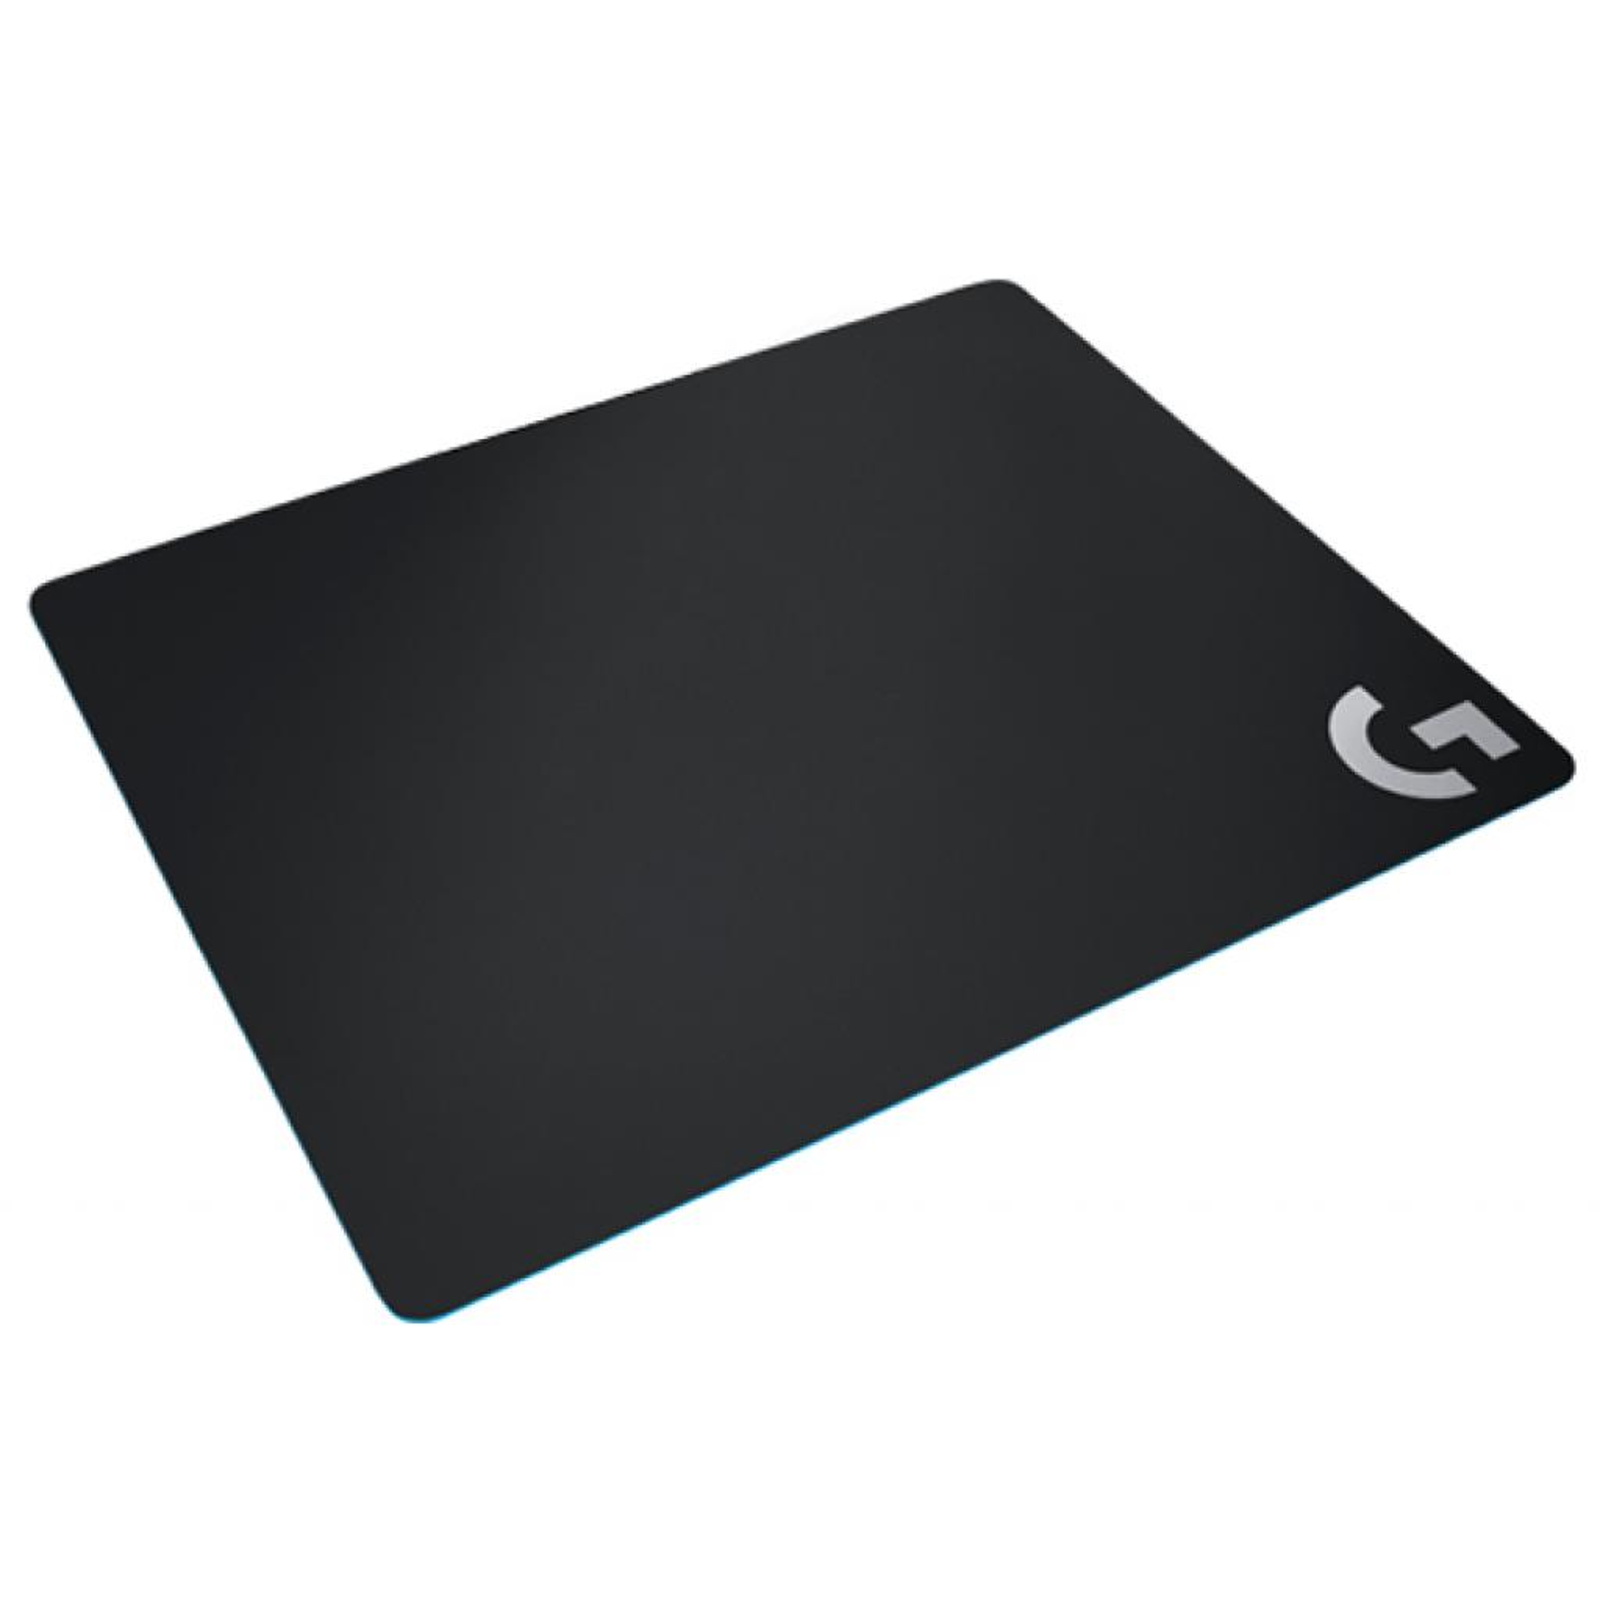 Коврик Logitech G440 Hard Gaming Mouse Pad (943-000099)